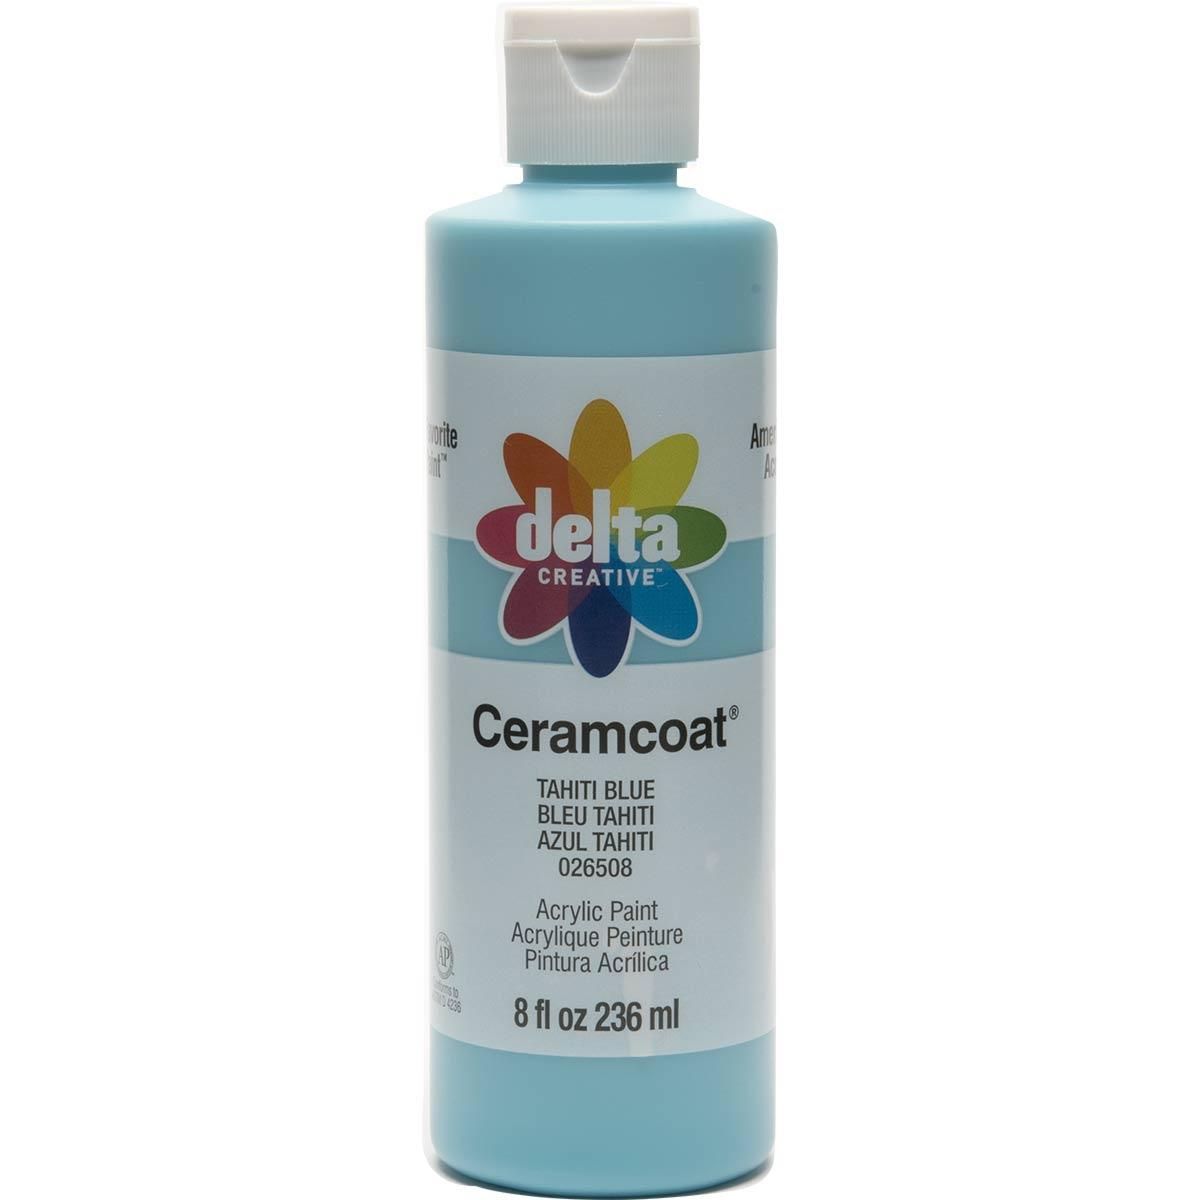 Delta Ceramcoat ® Acrylic Paint - Tahiti Blue, 8 oz. - 026508